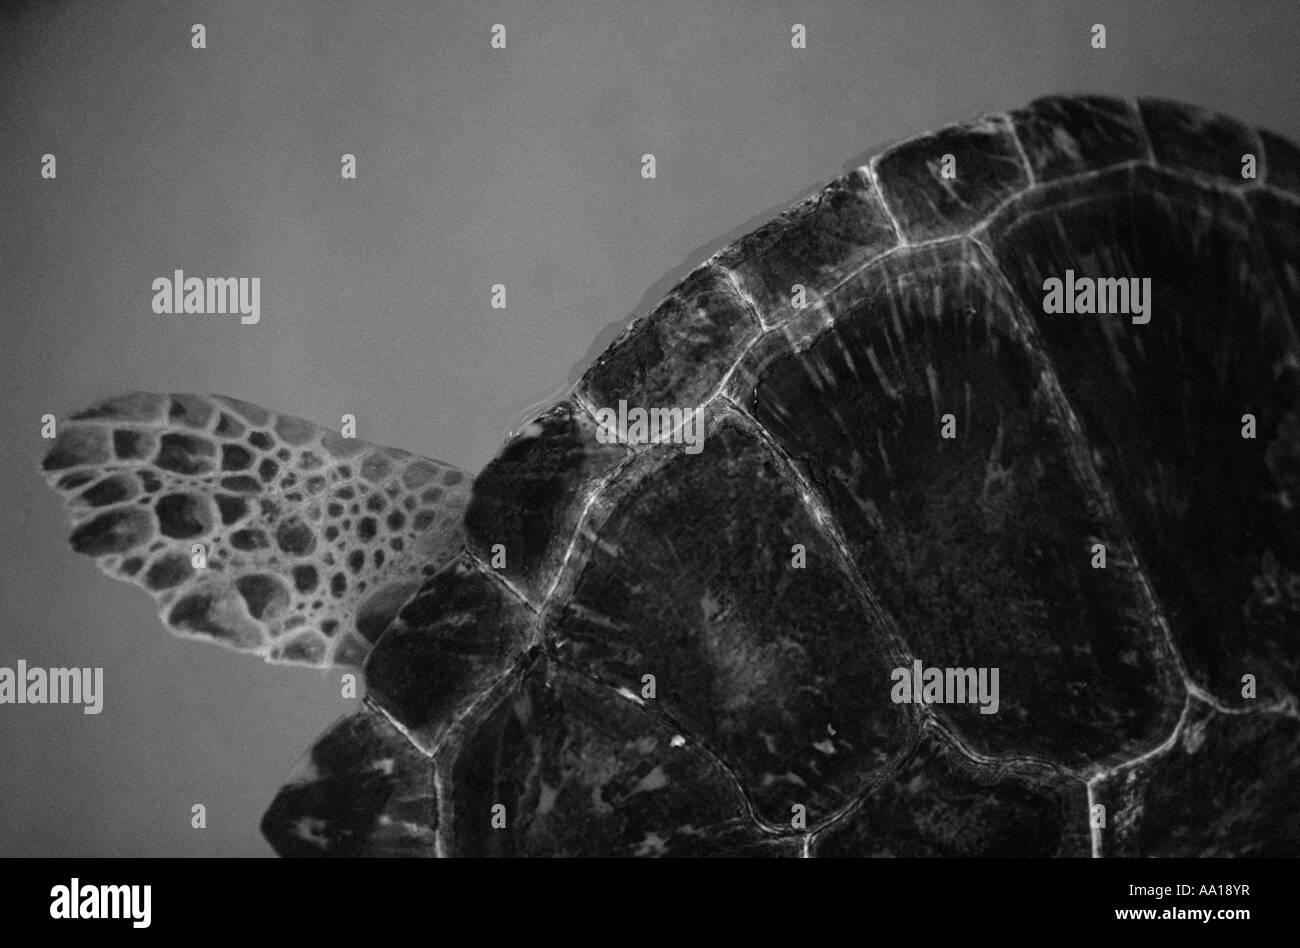 Anatomy Turtle Stock Photos Anatomy Turtle Stock Images Alamy